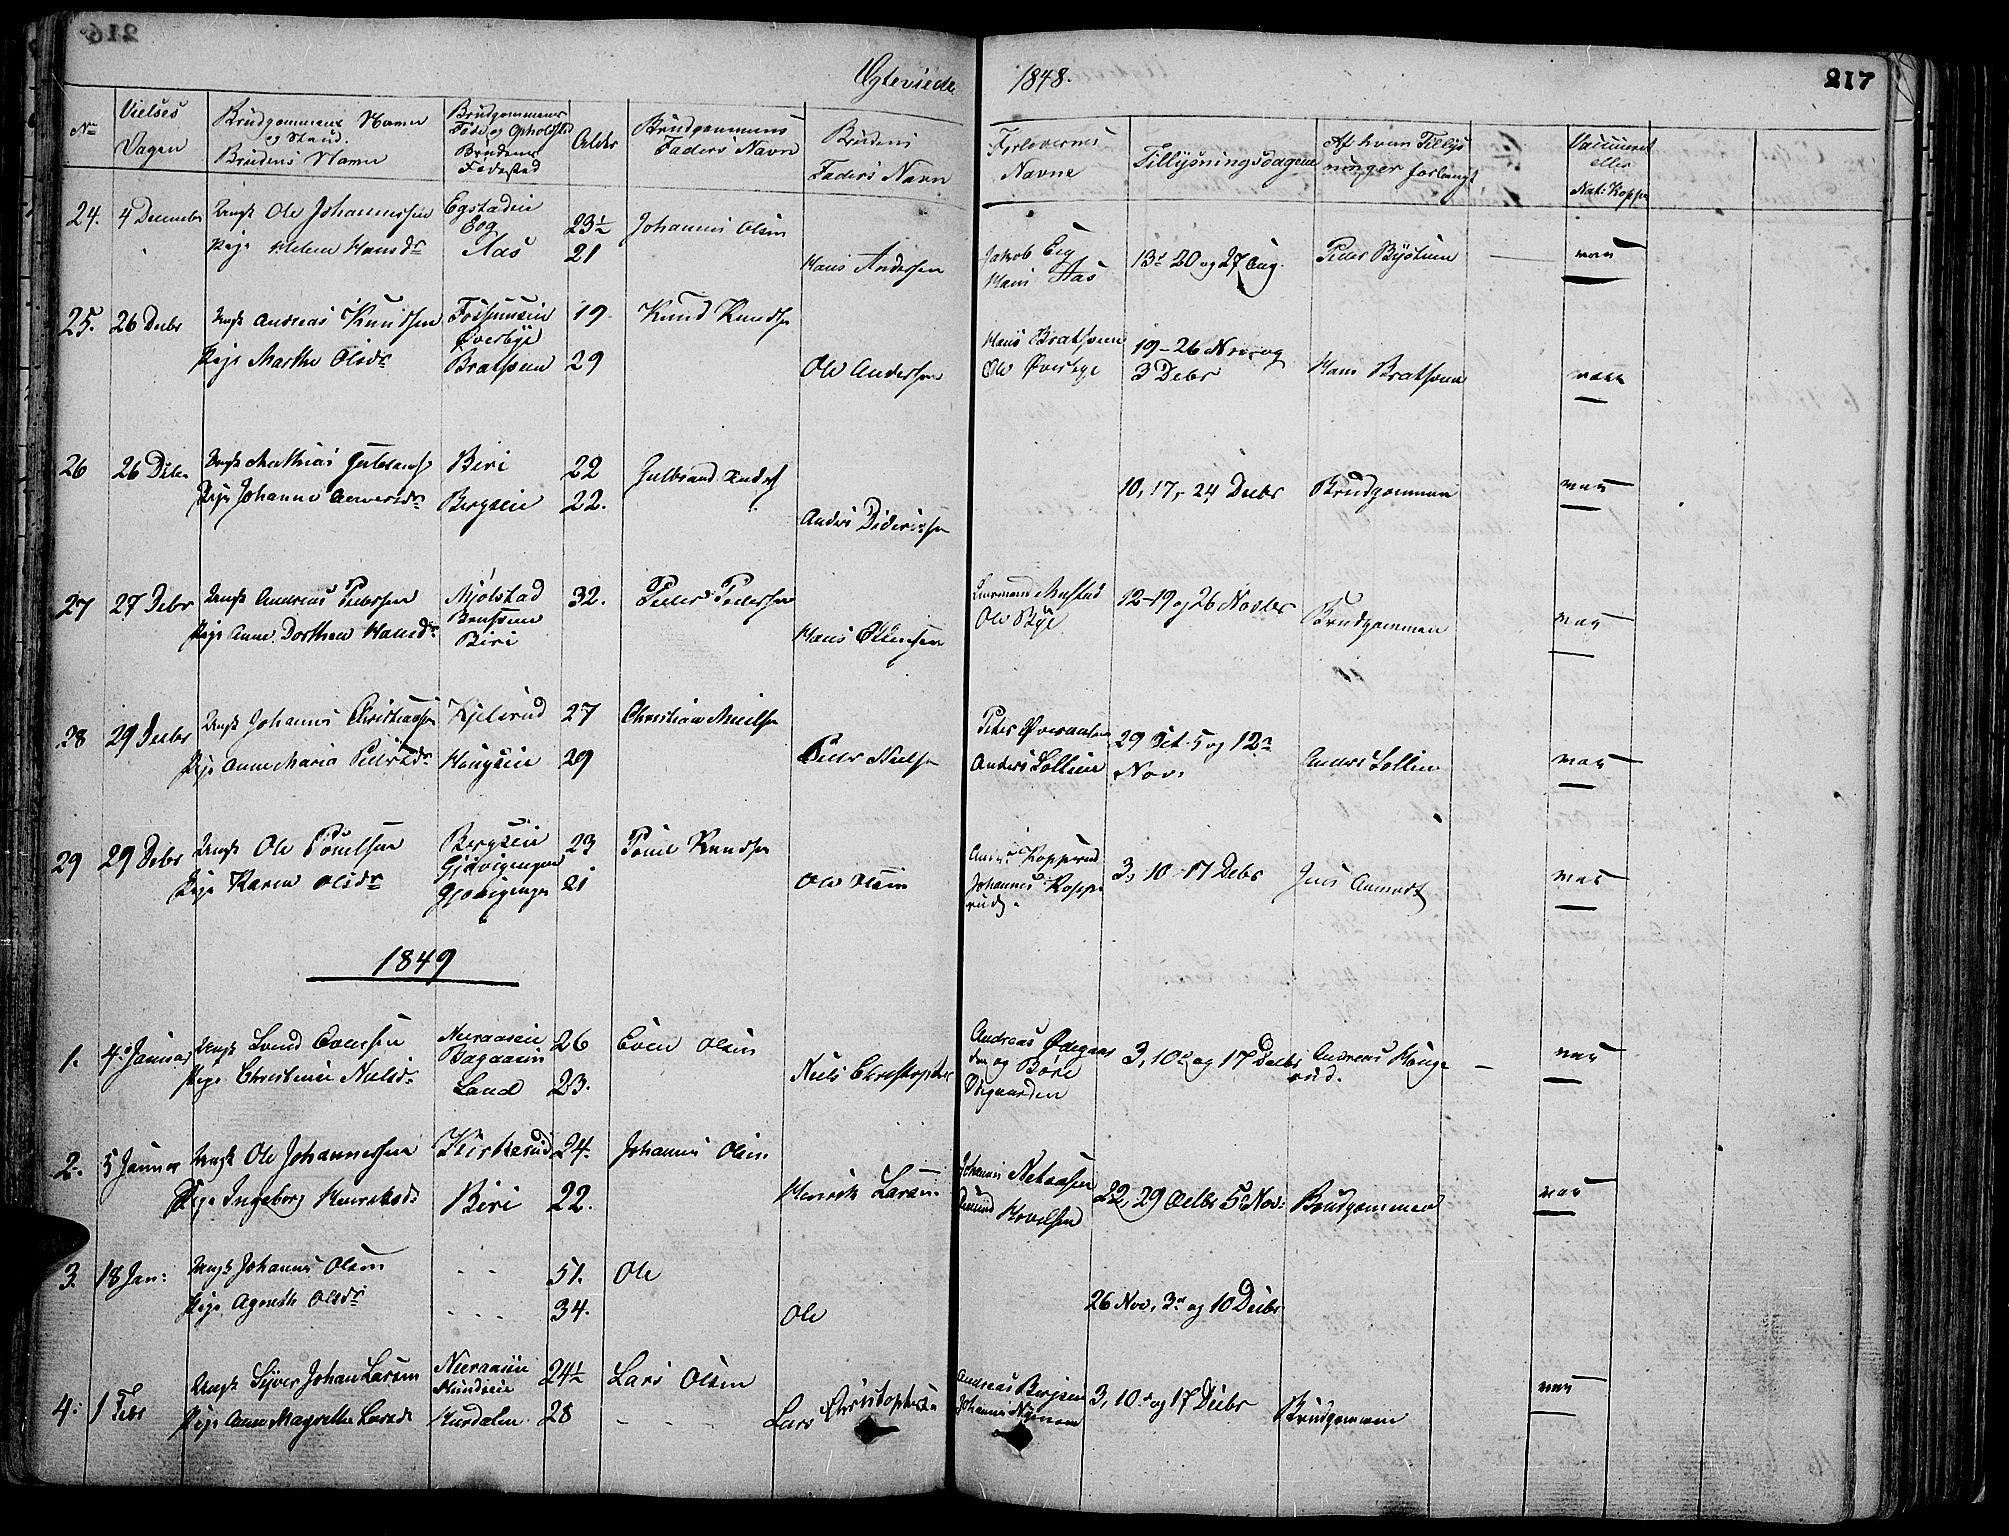 SAH, Vardal prestekontor, H/Ha/Hab/L0004: Klokkerbok nr. 4, 1831-1853, s. 217